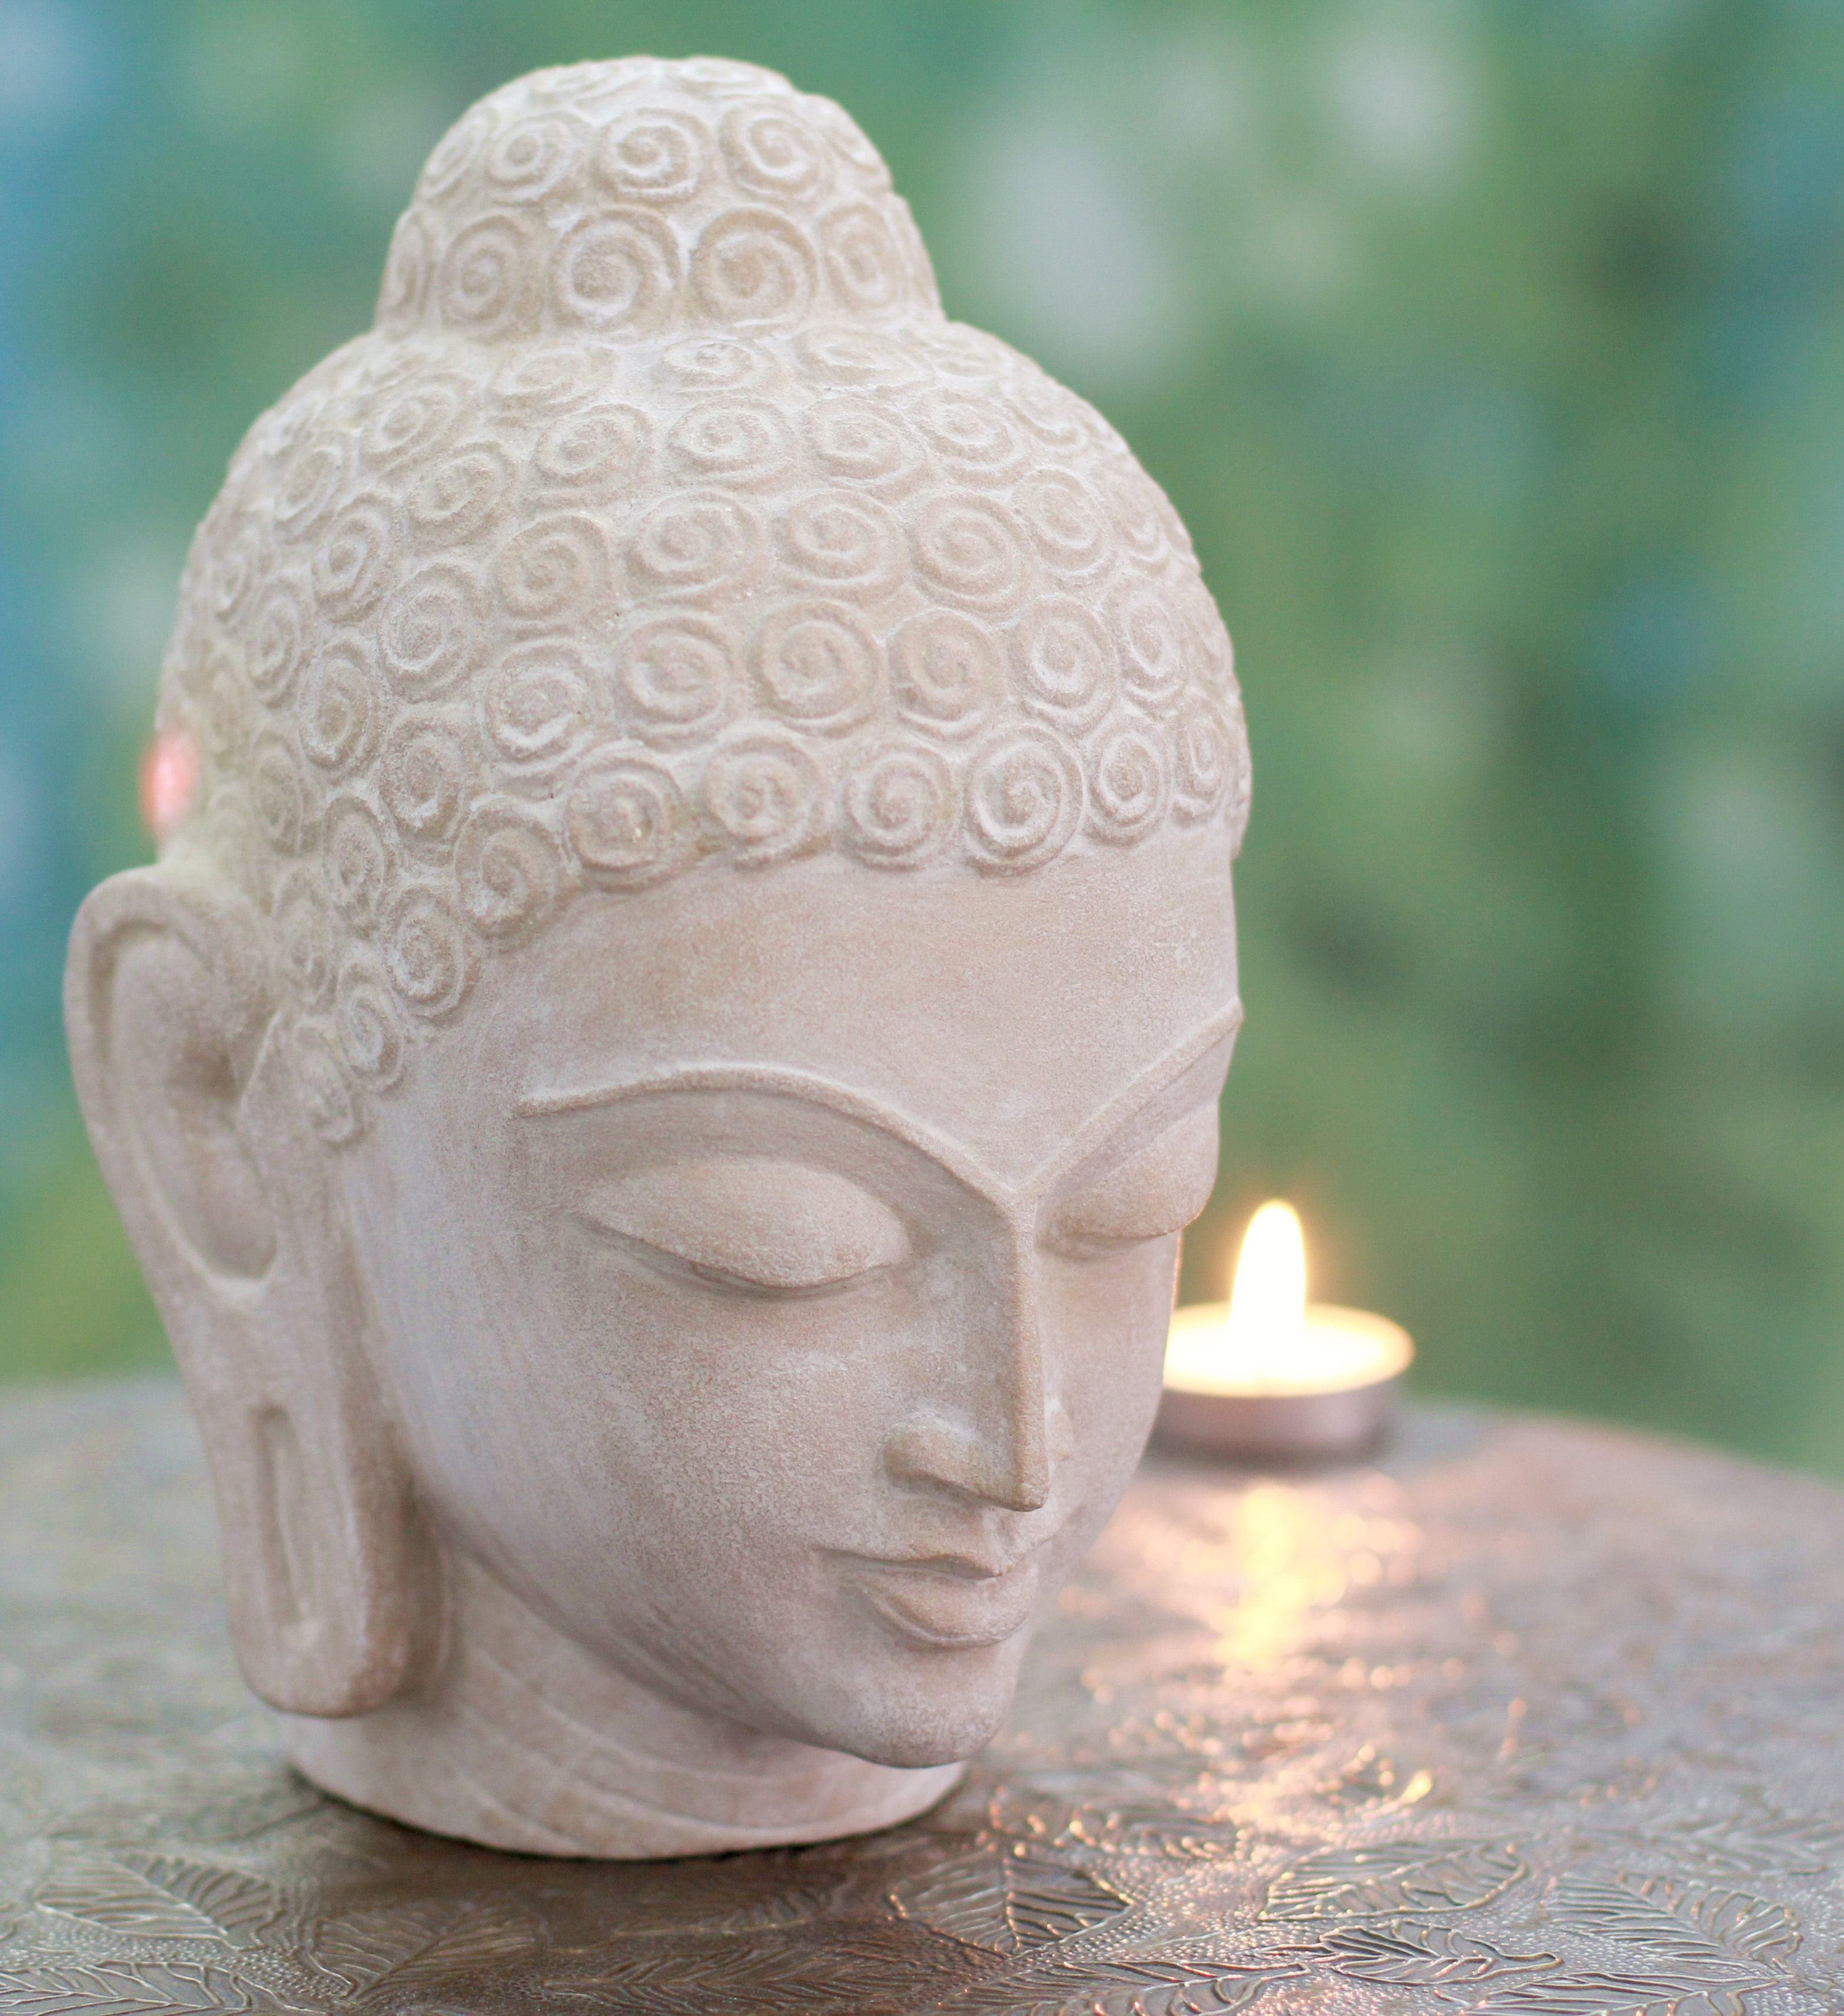 Sandstone Buddha Statue,Hands Namaste Yoga Mudra Abstract Sculptures Home Decor,Elegant Decorations